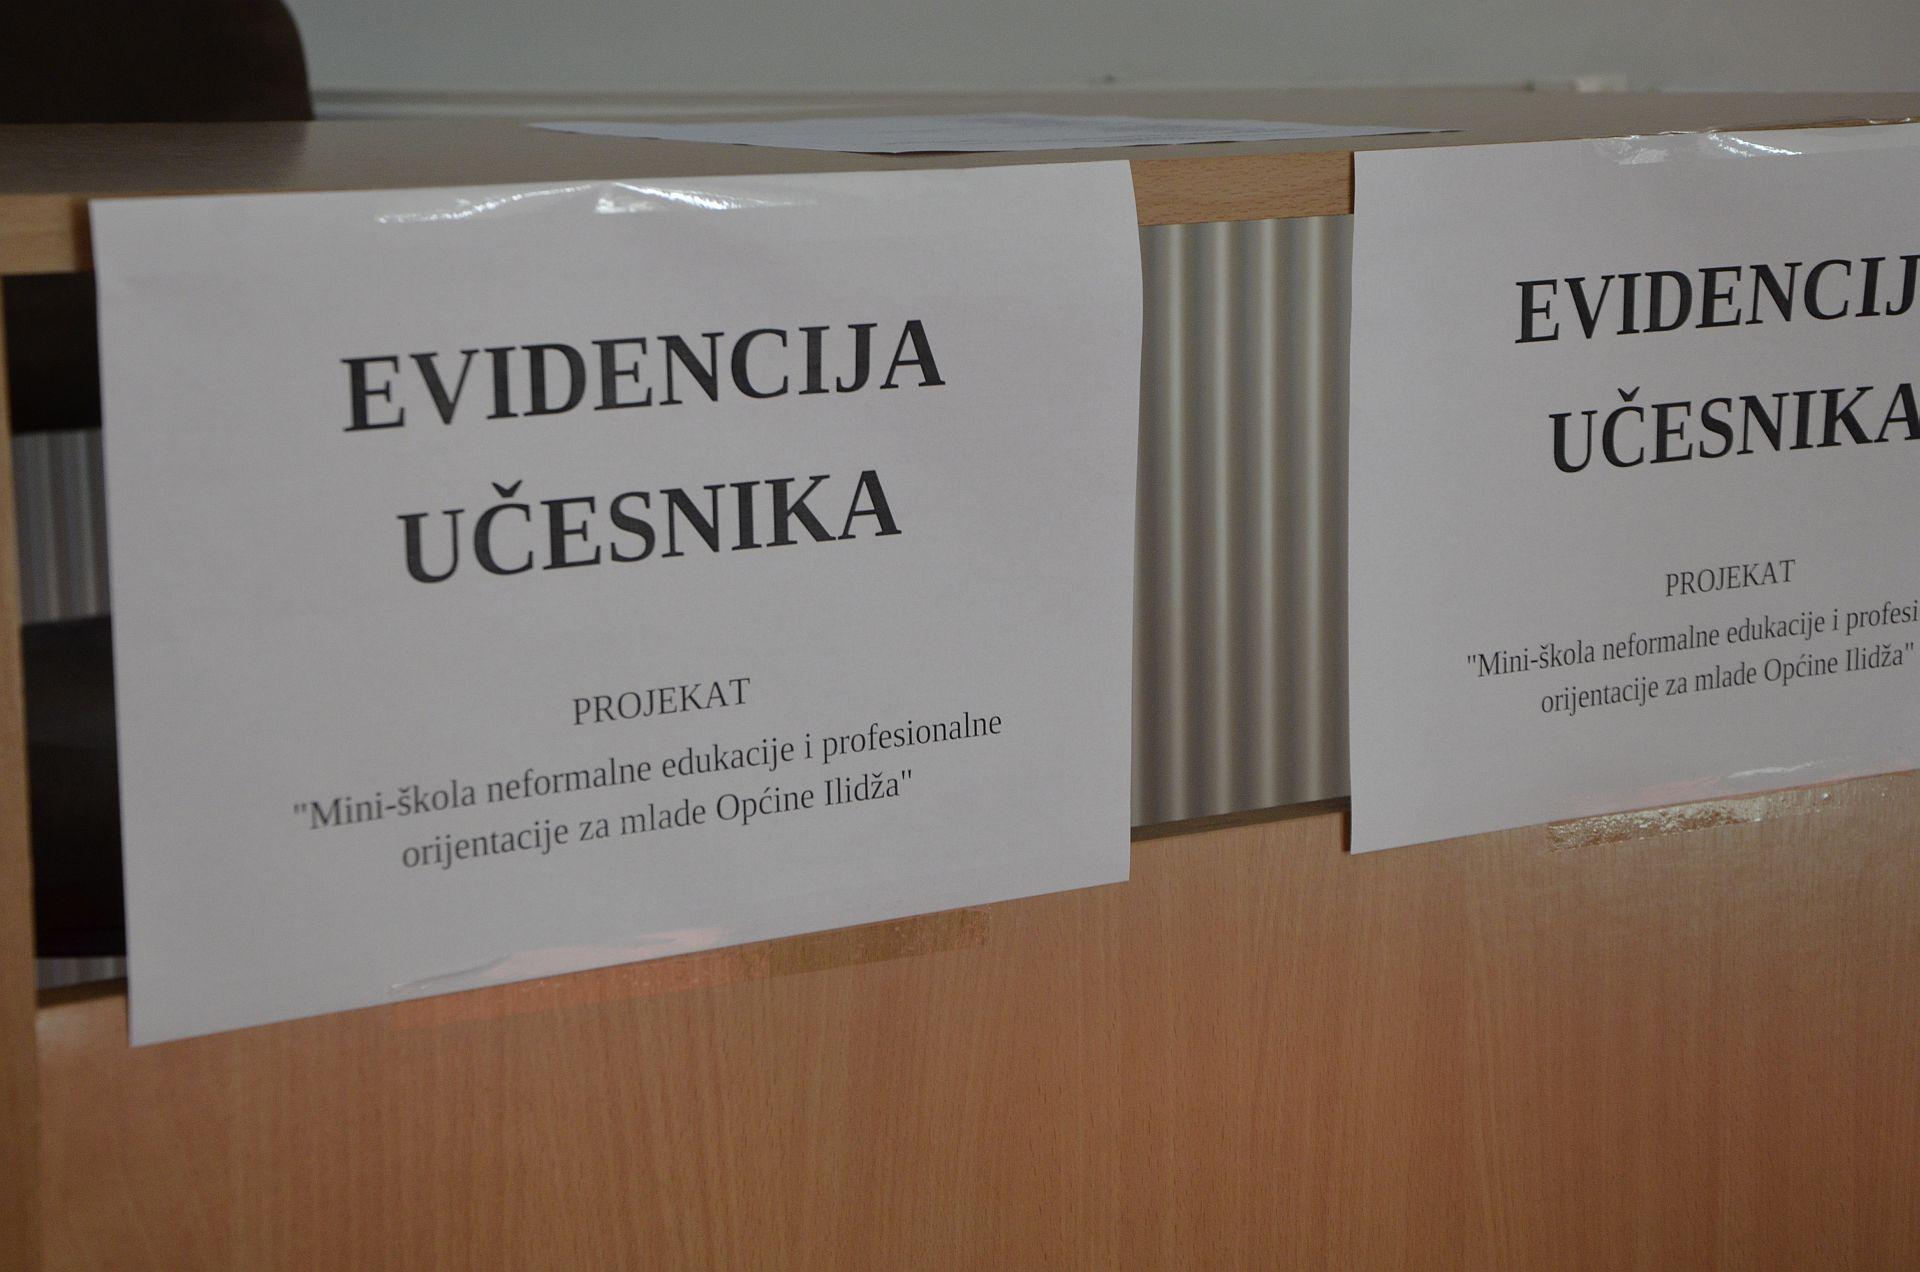 Mini-skola za mlade Opcine Ilidza 27.10.2018.f